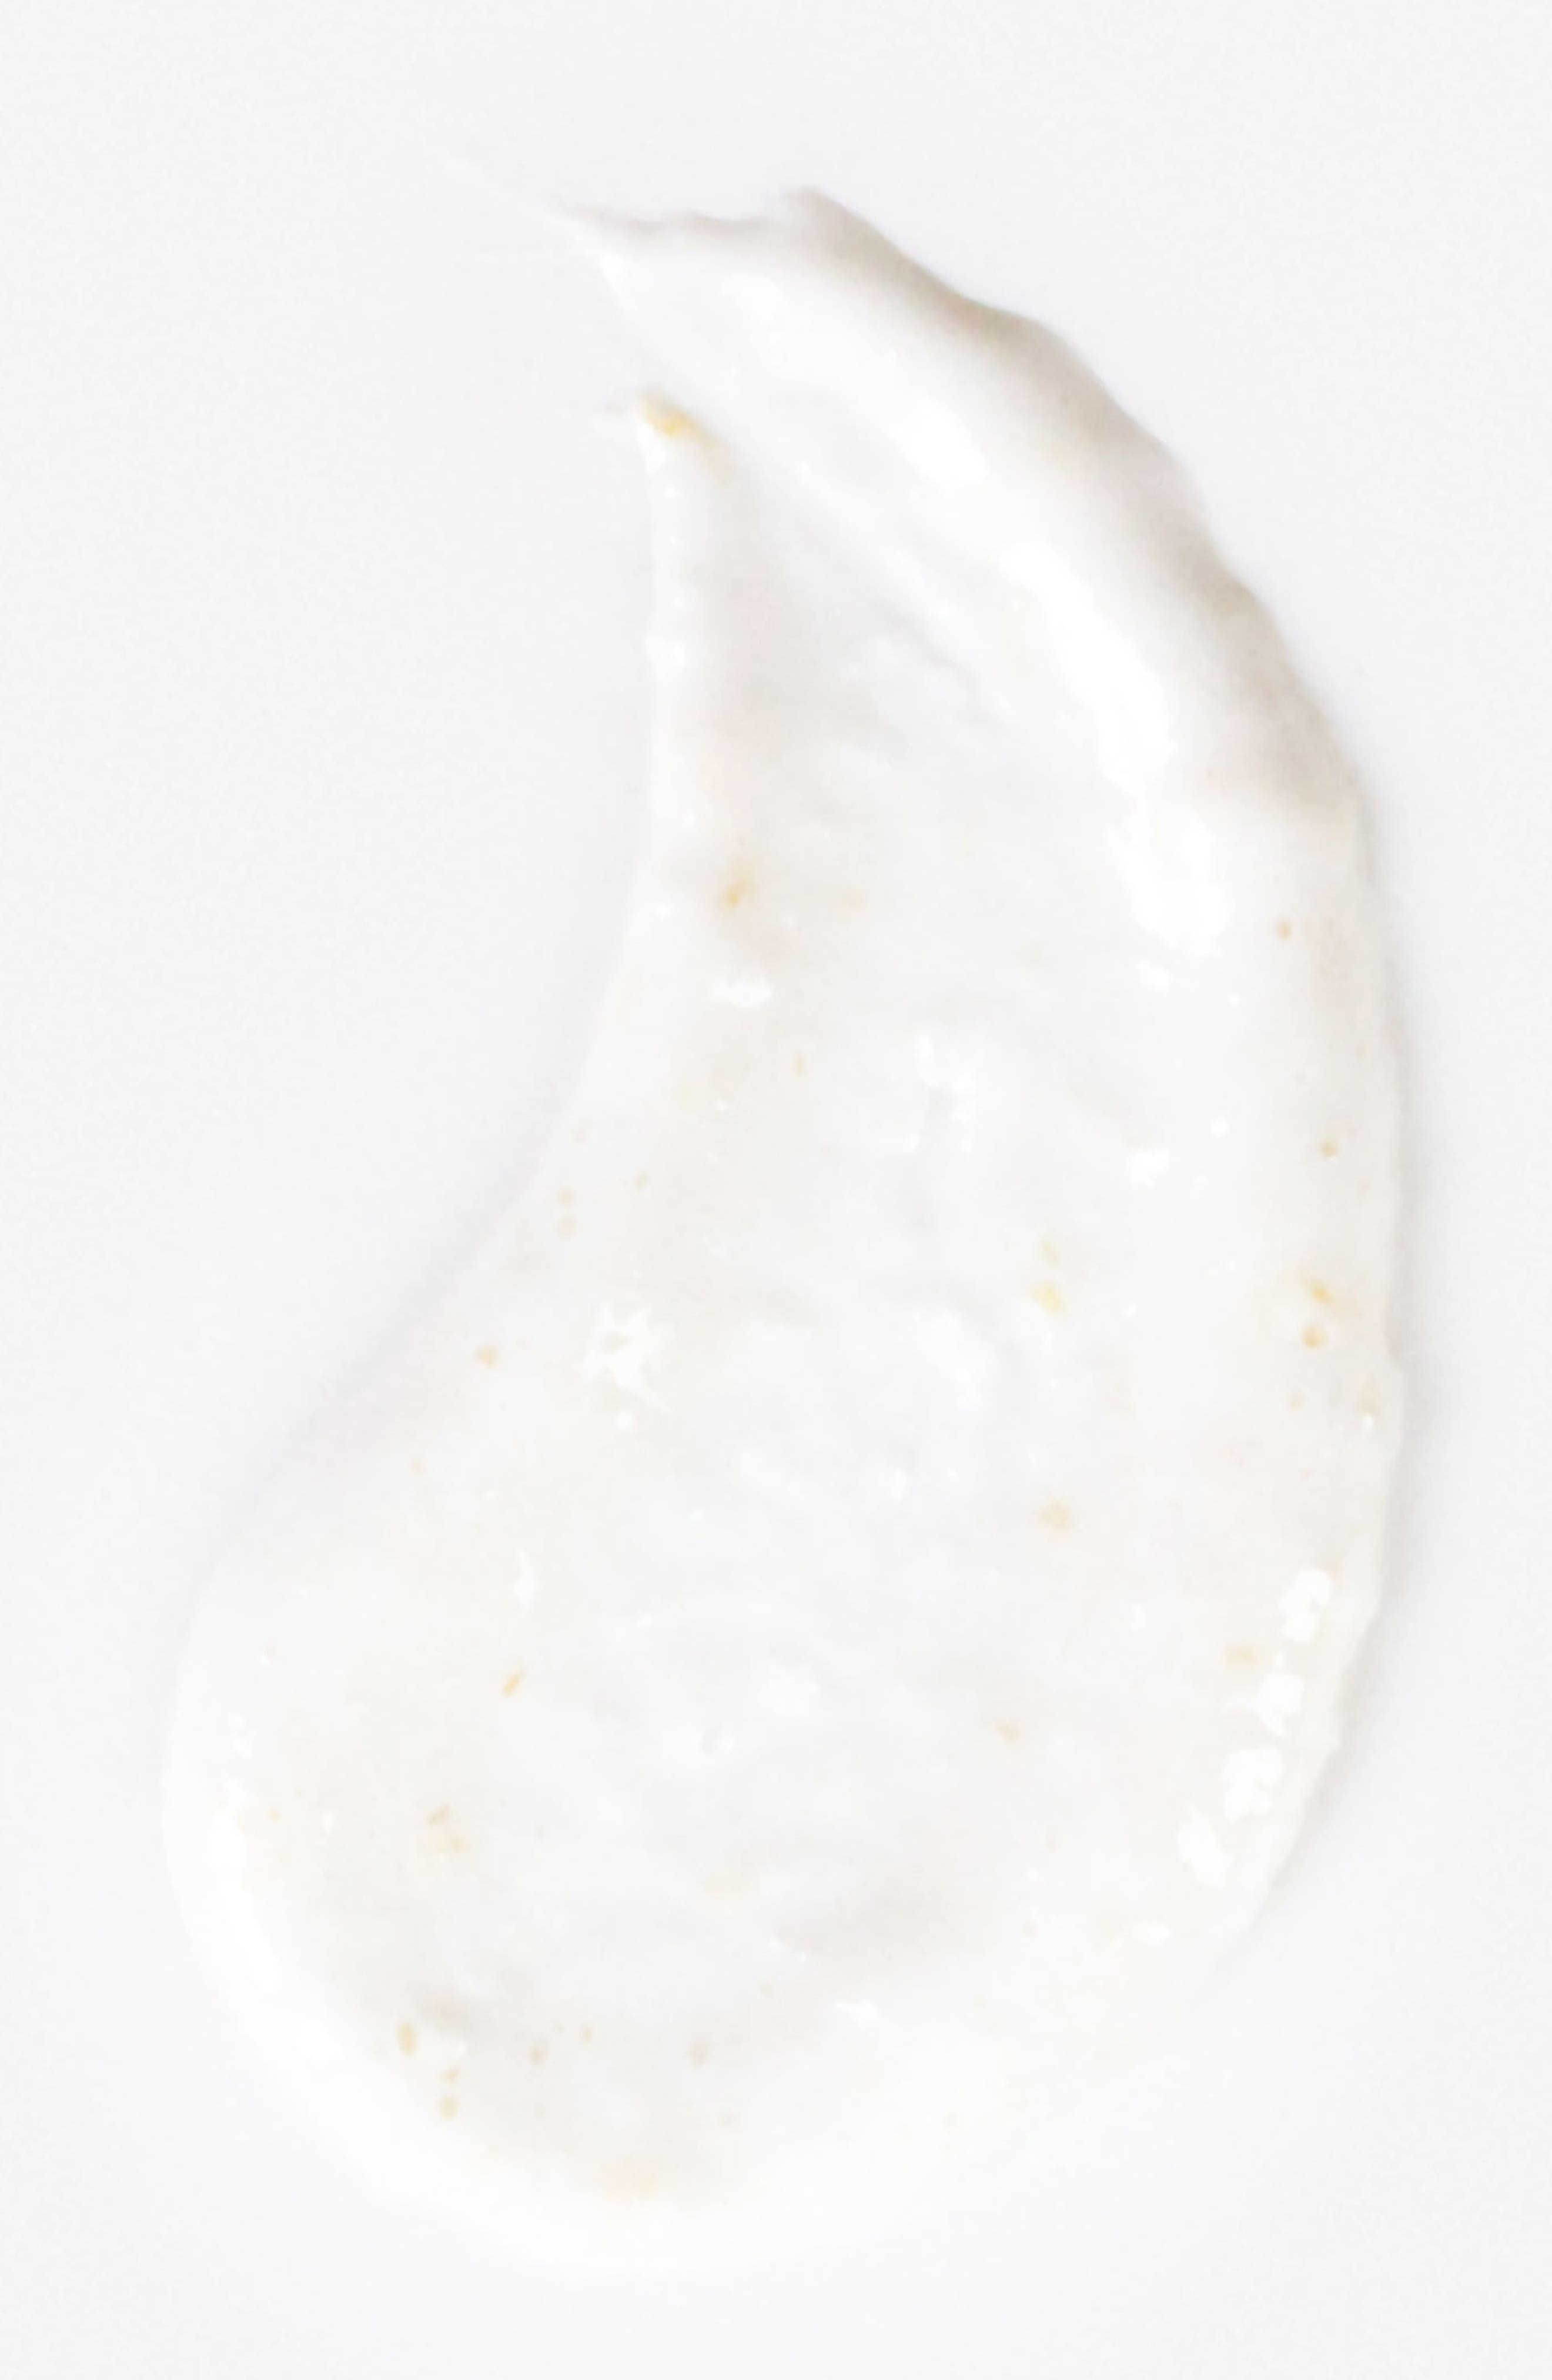 Gentle Exfoliating Body Scrub,                             Alternate thumbnail 2, color,                             Grapefruit